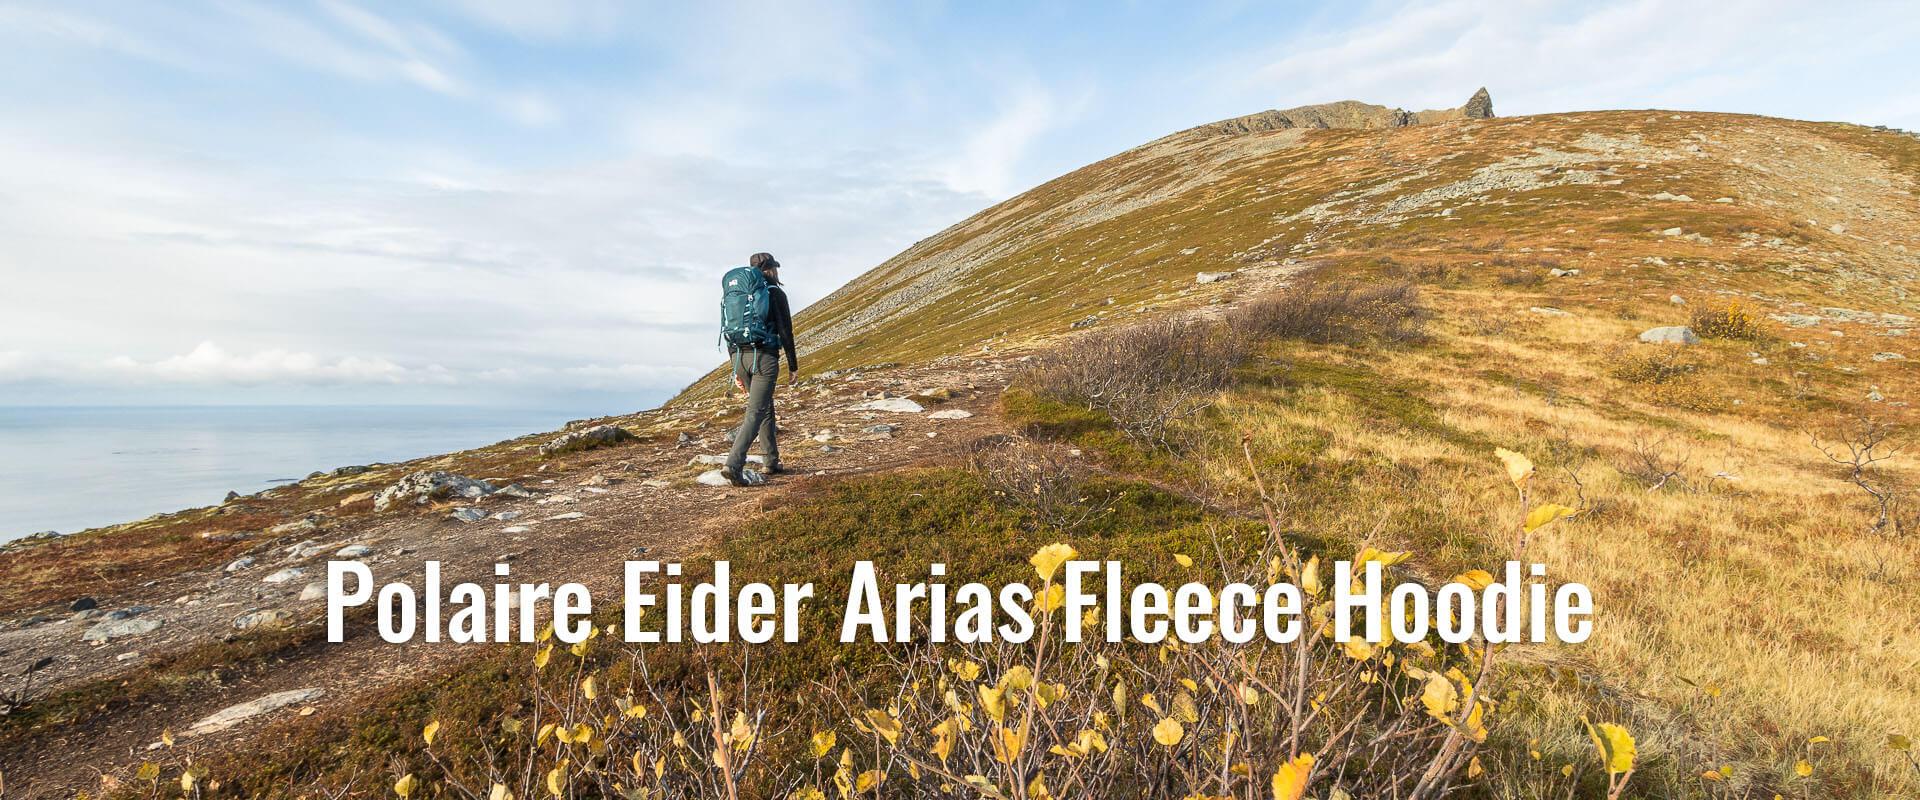 Eider Arias Fleece Hoodie